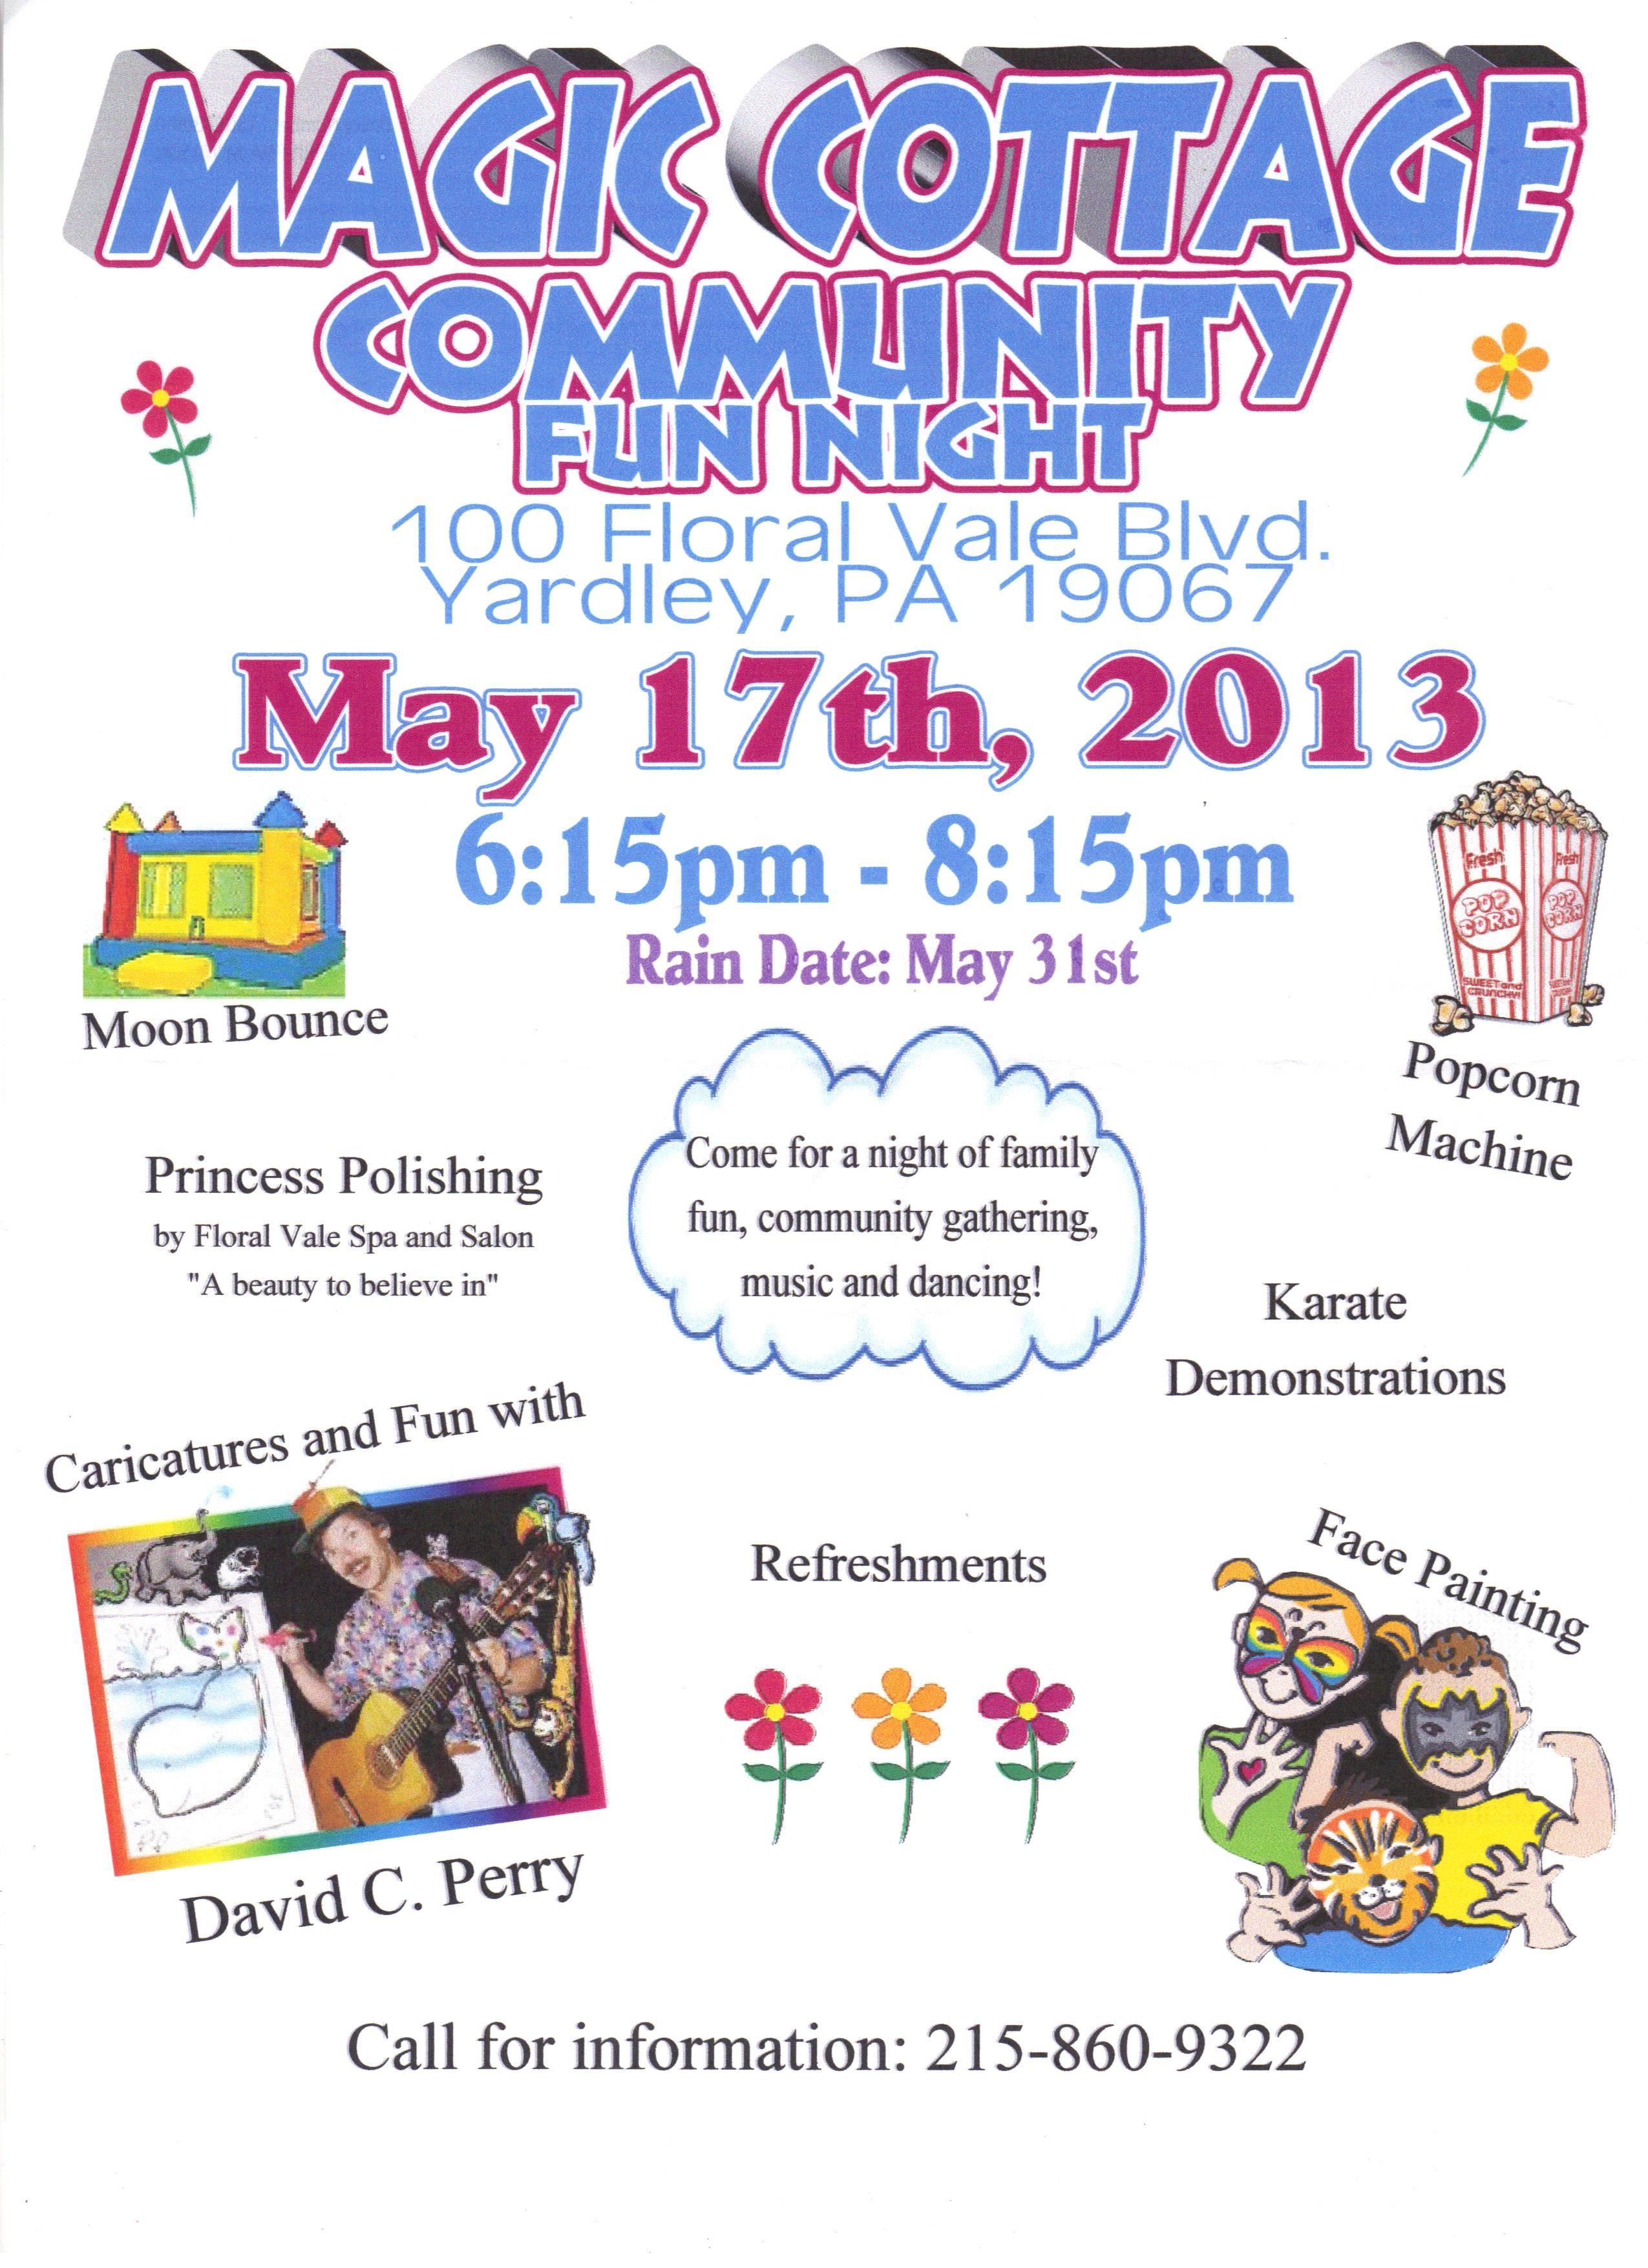 The Community Fun Night flyer!